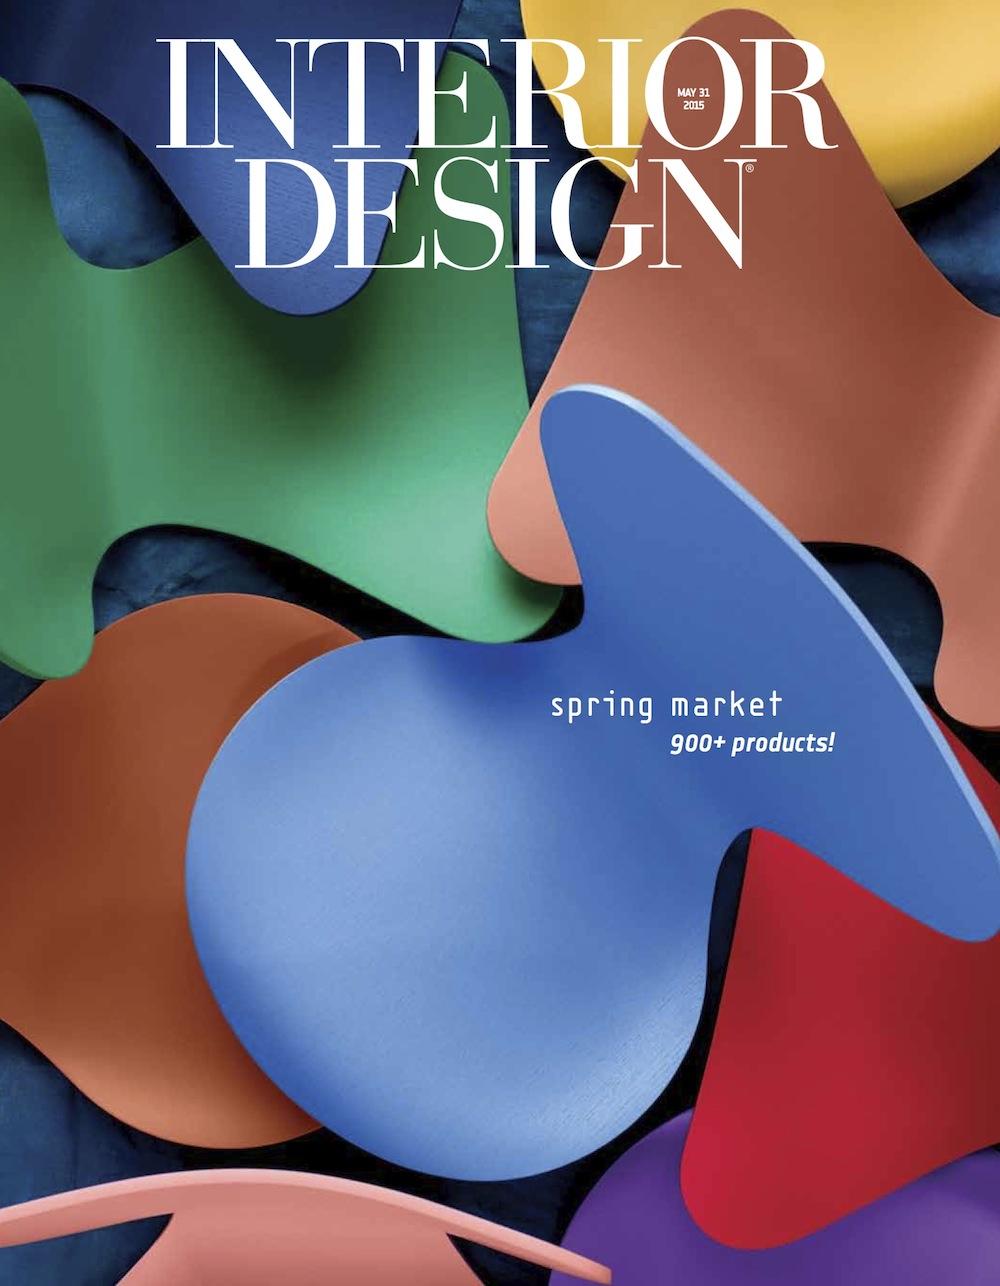 Interior-Design-June-2015-Cover